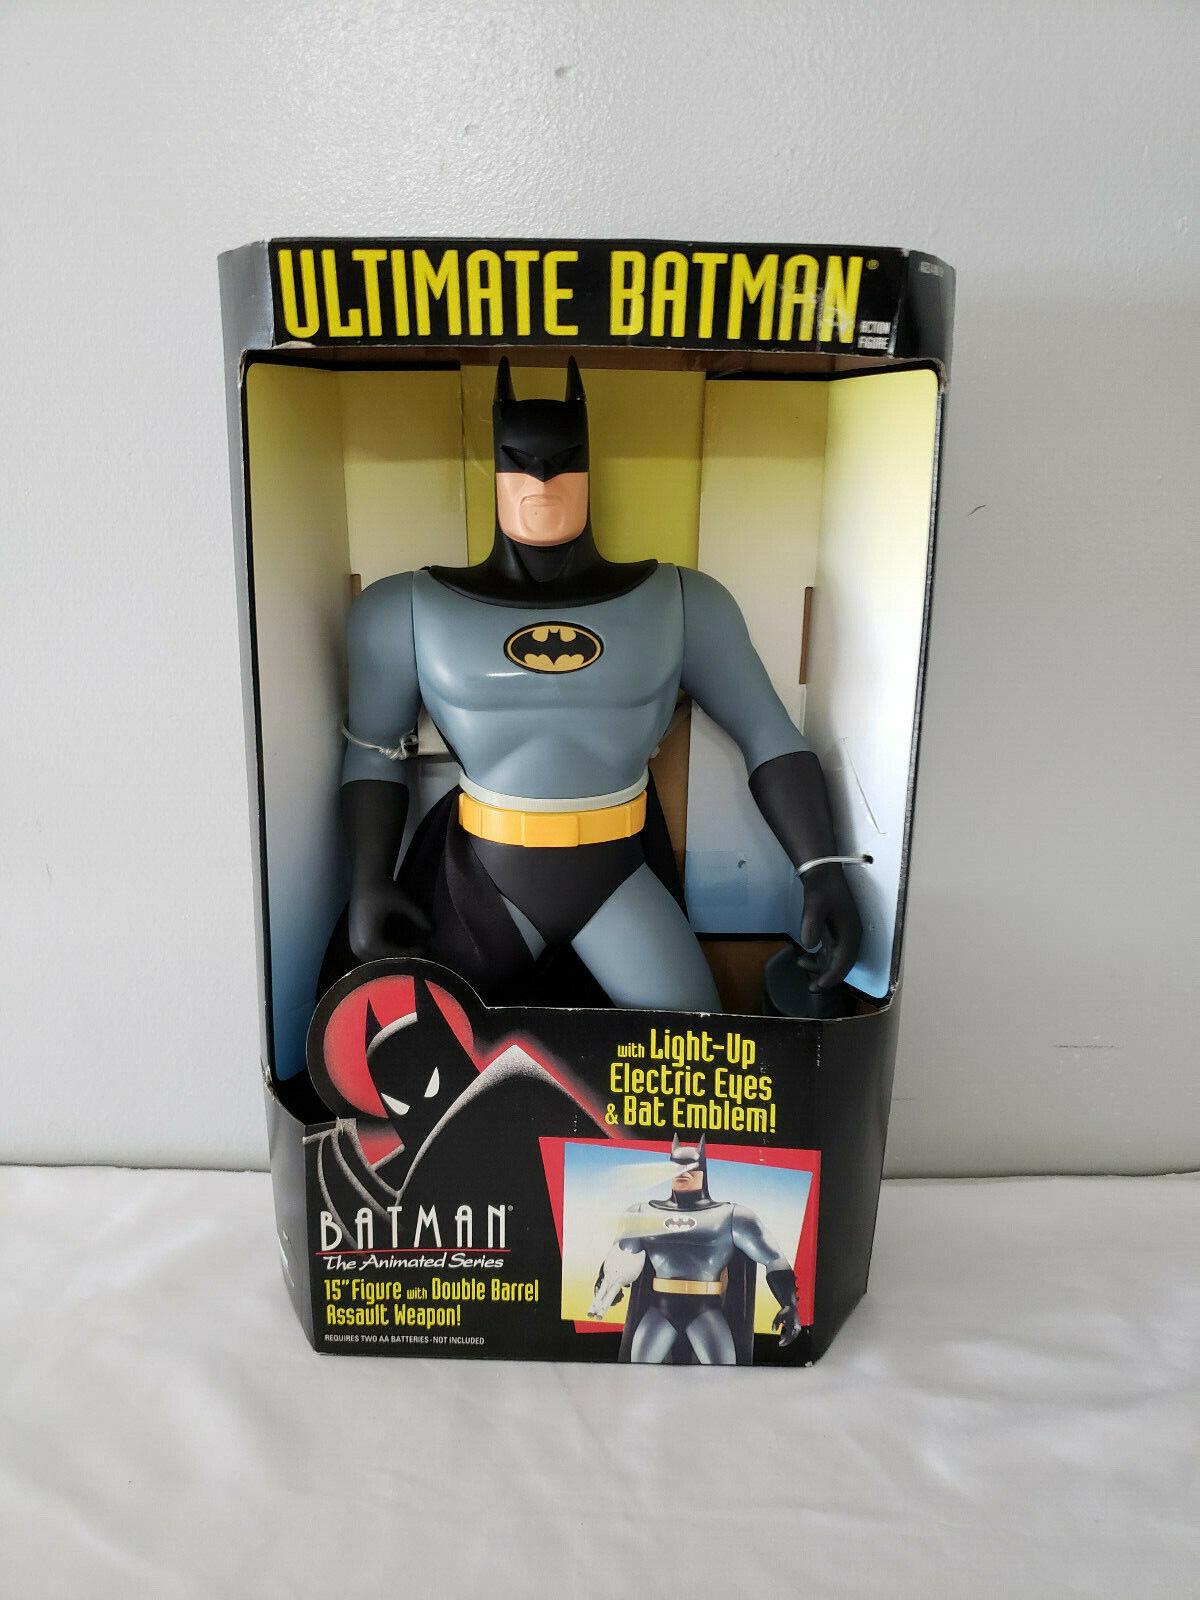 Ultimate Batman 15  Figure w Double Barrel Assault Weapon Lights Up NIB